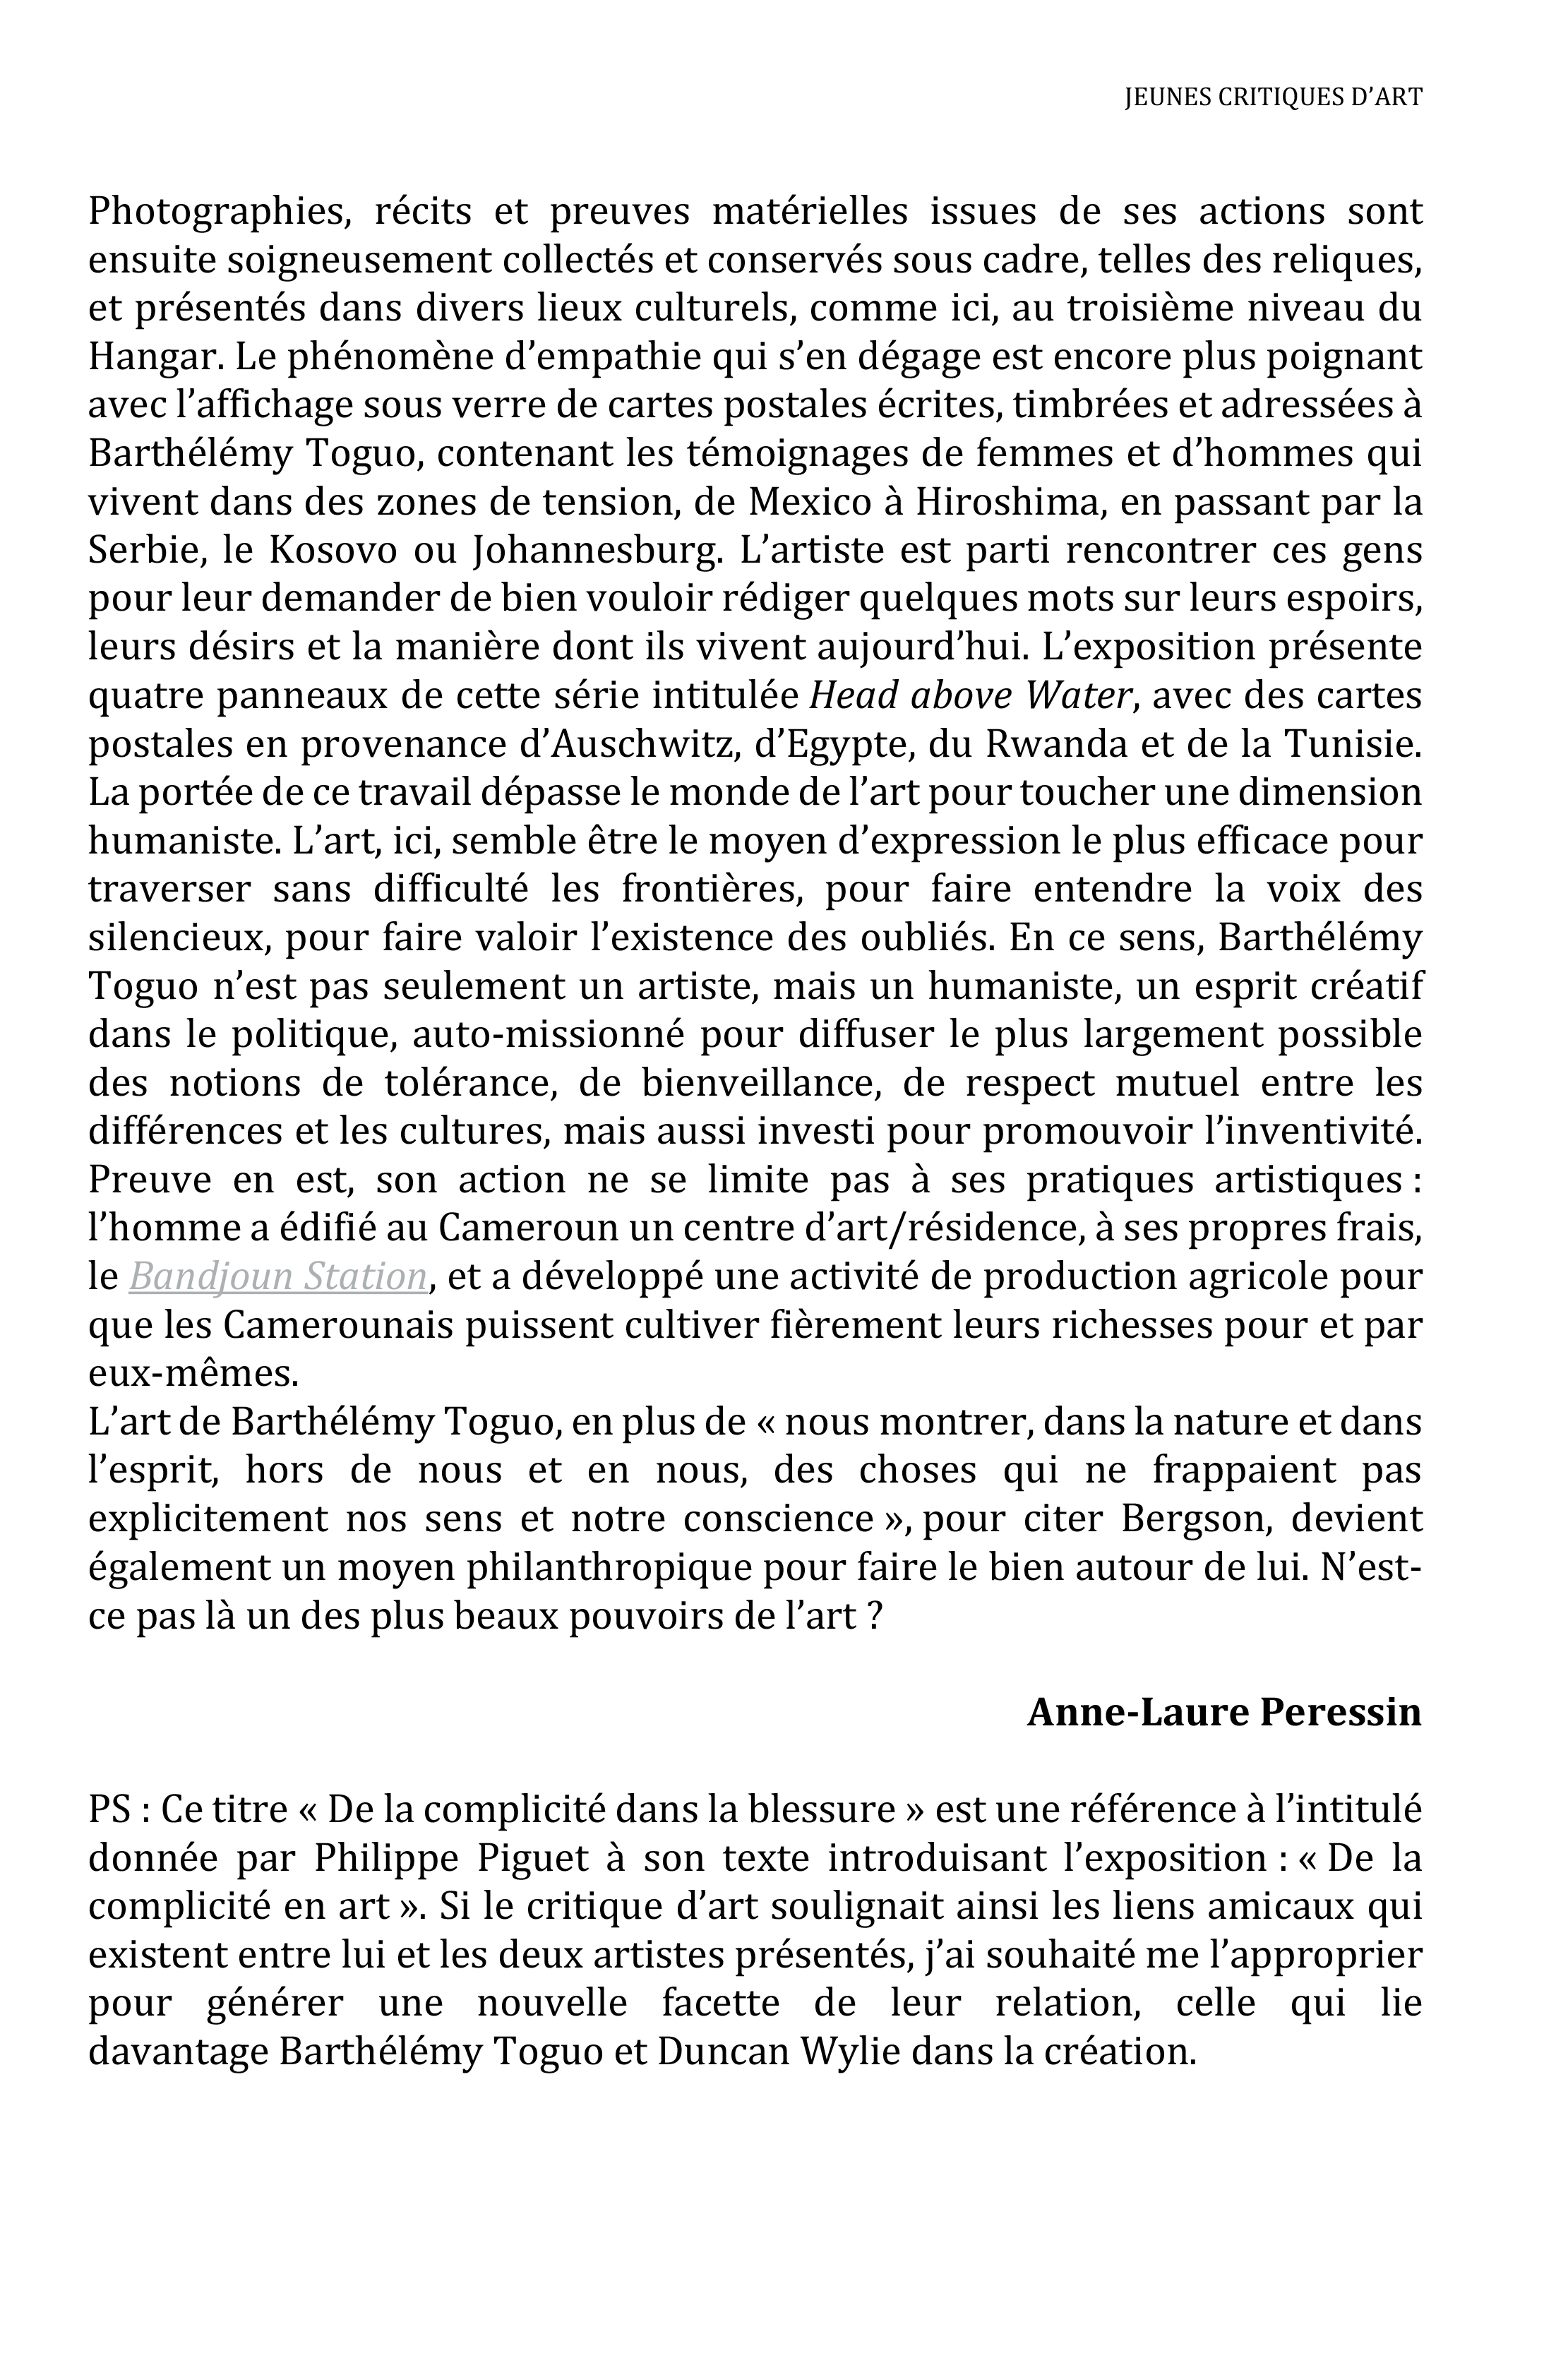 Anne-Laure Peressin-11.jpg